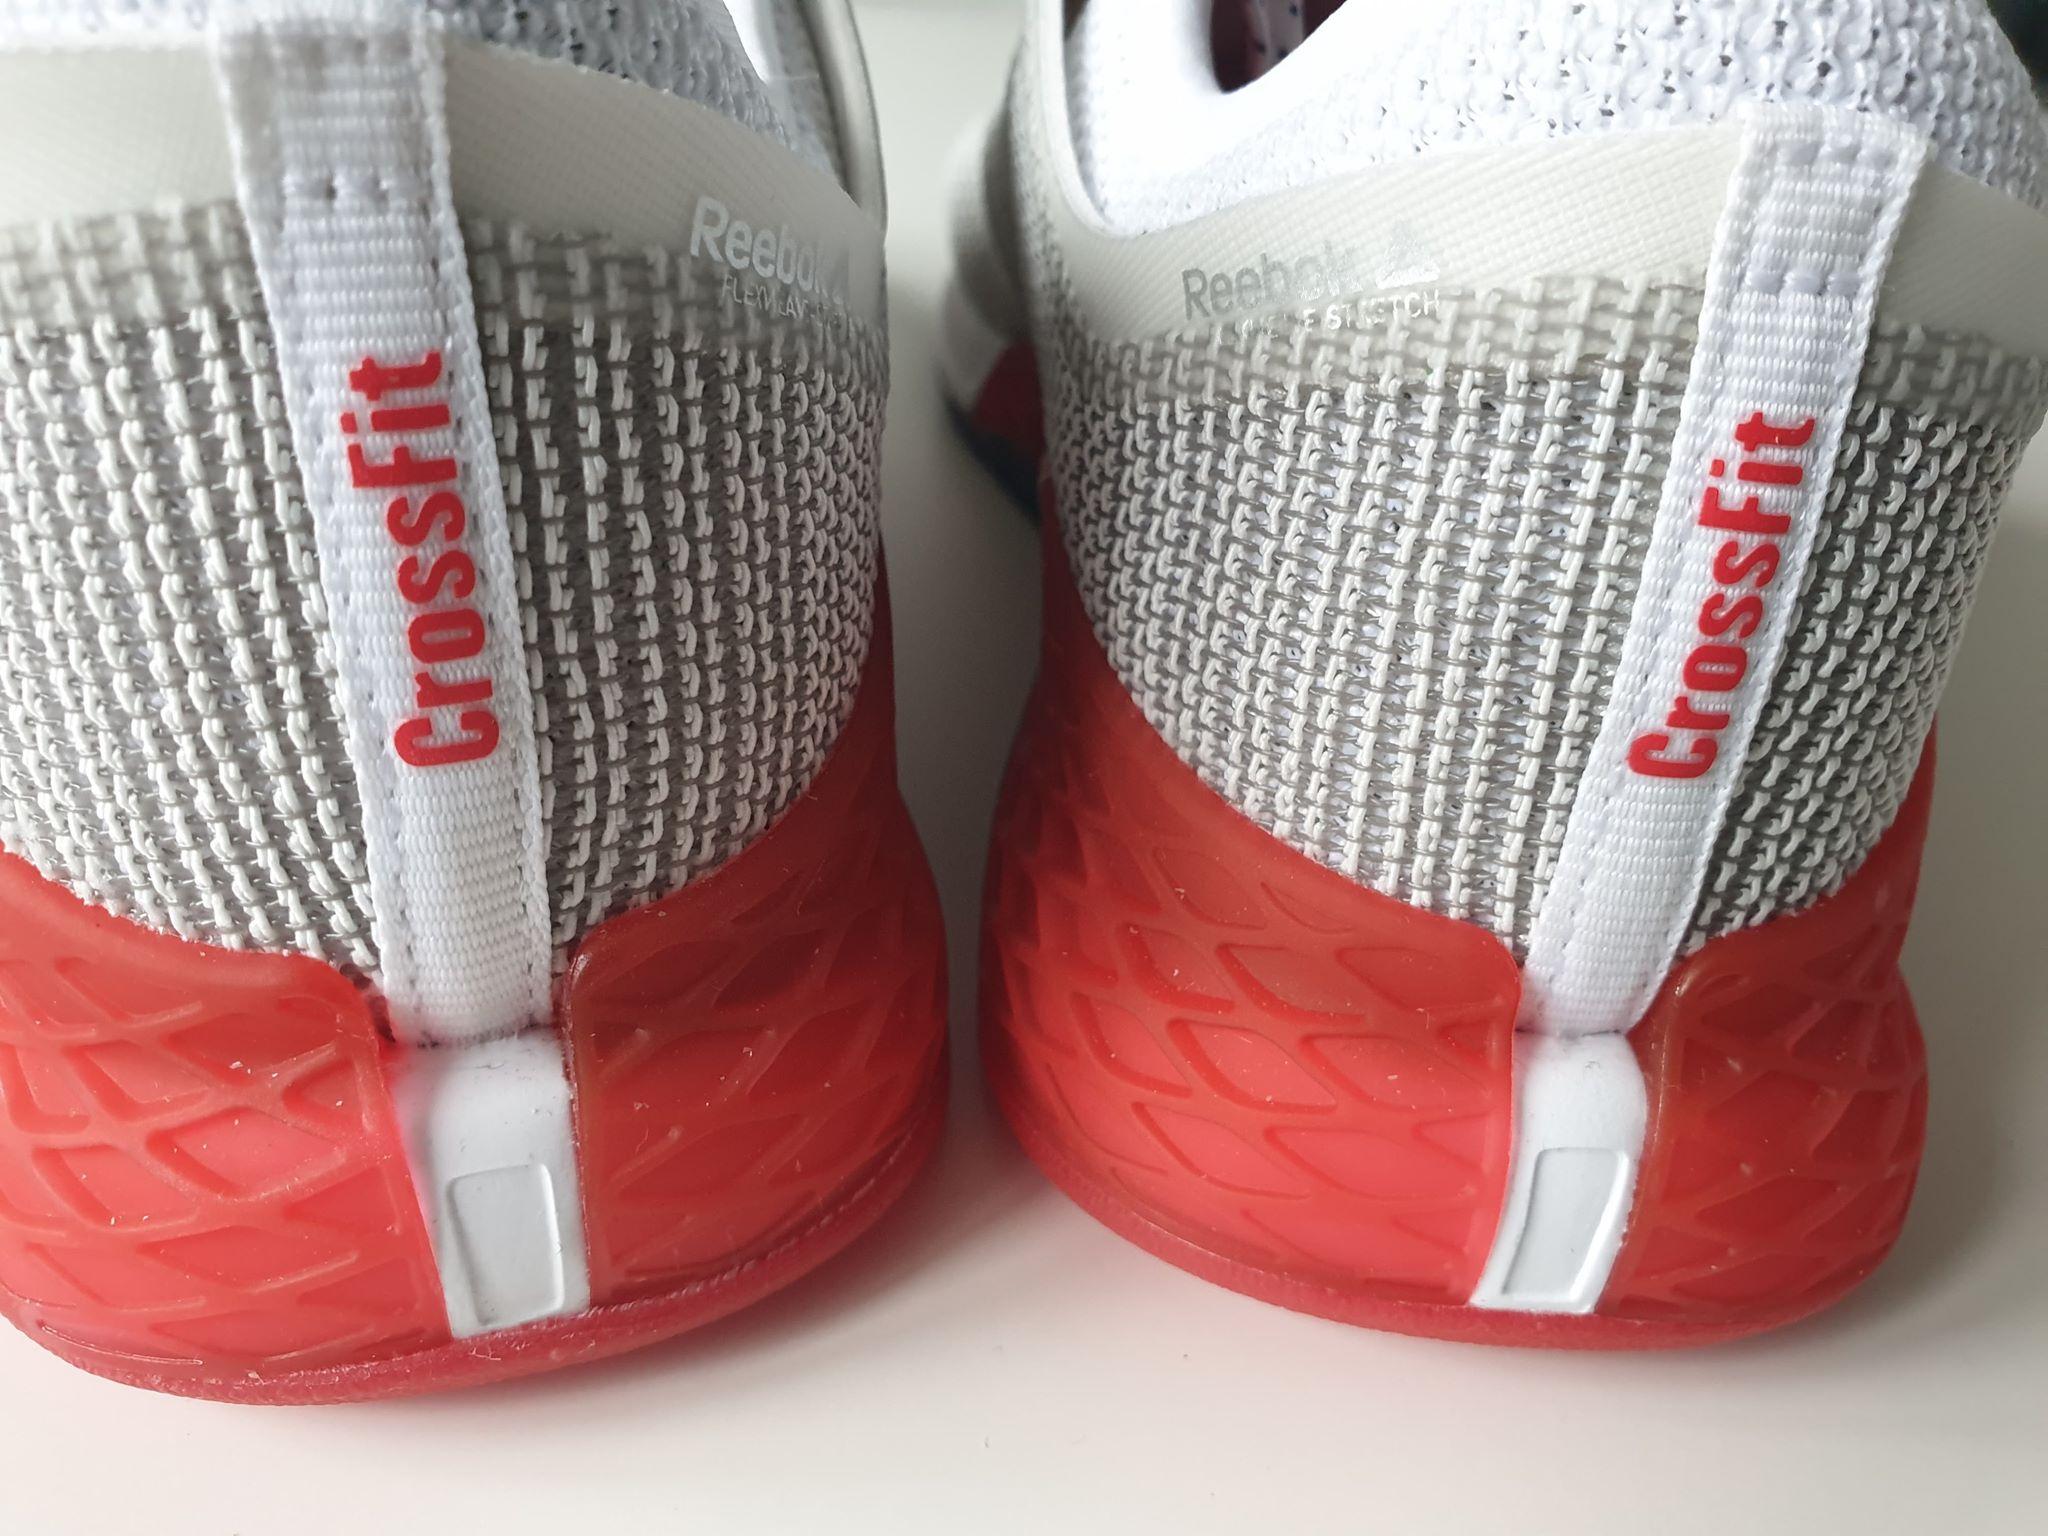 Crossfit Heel